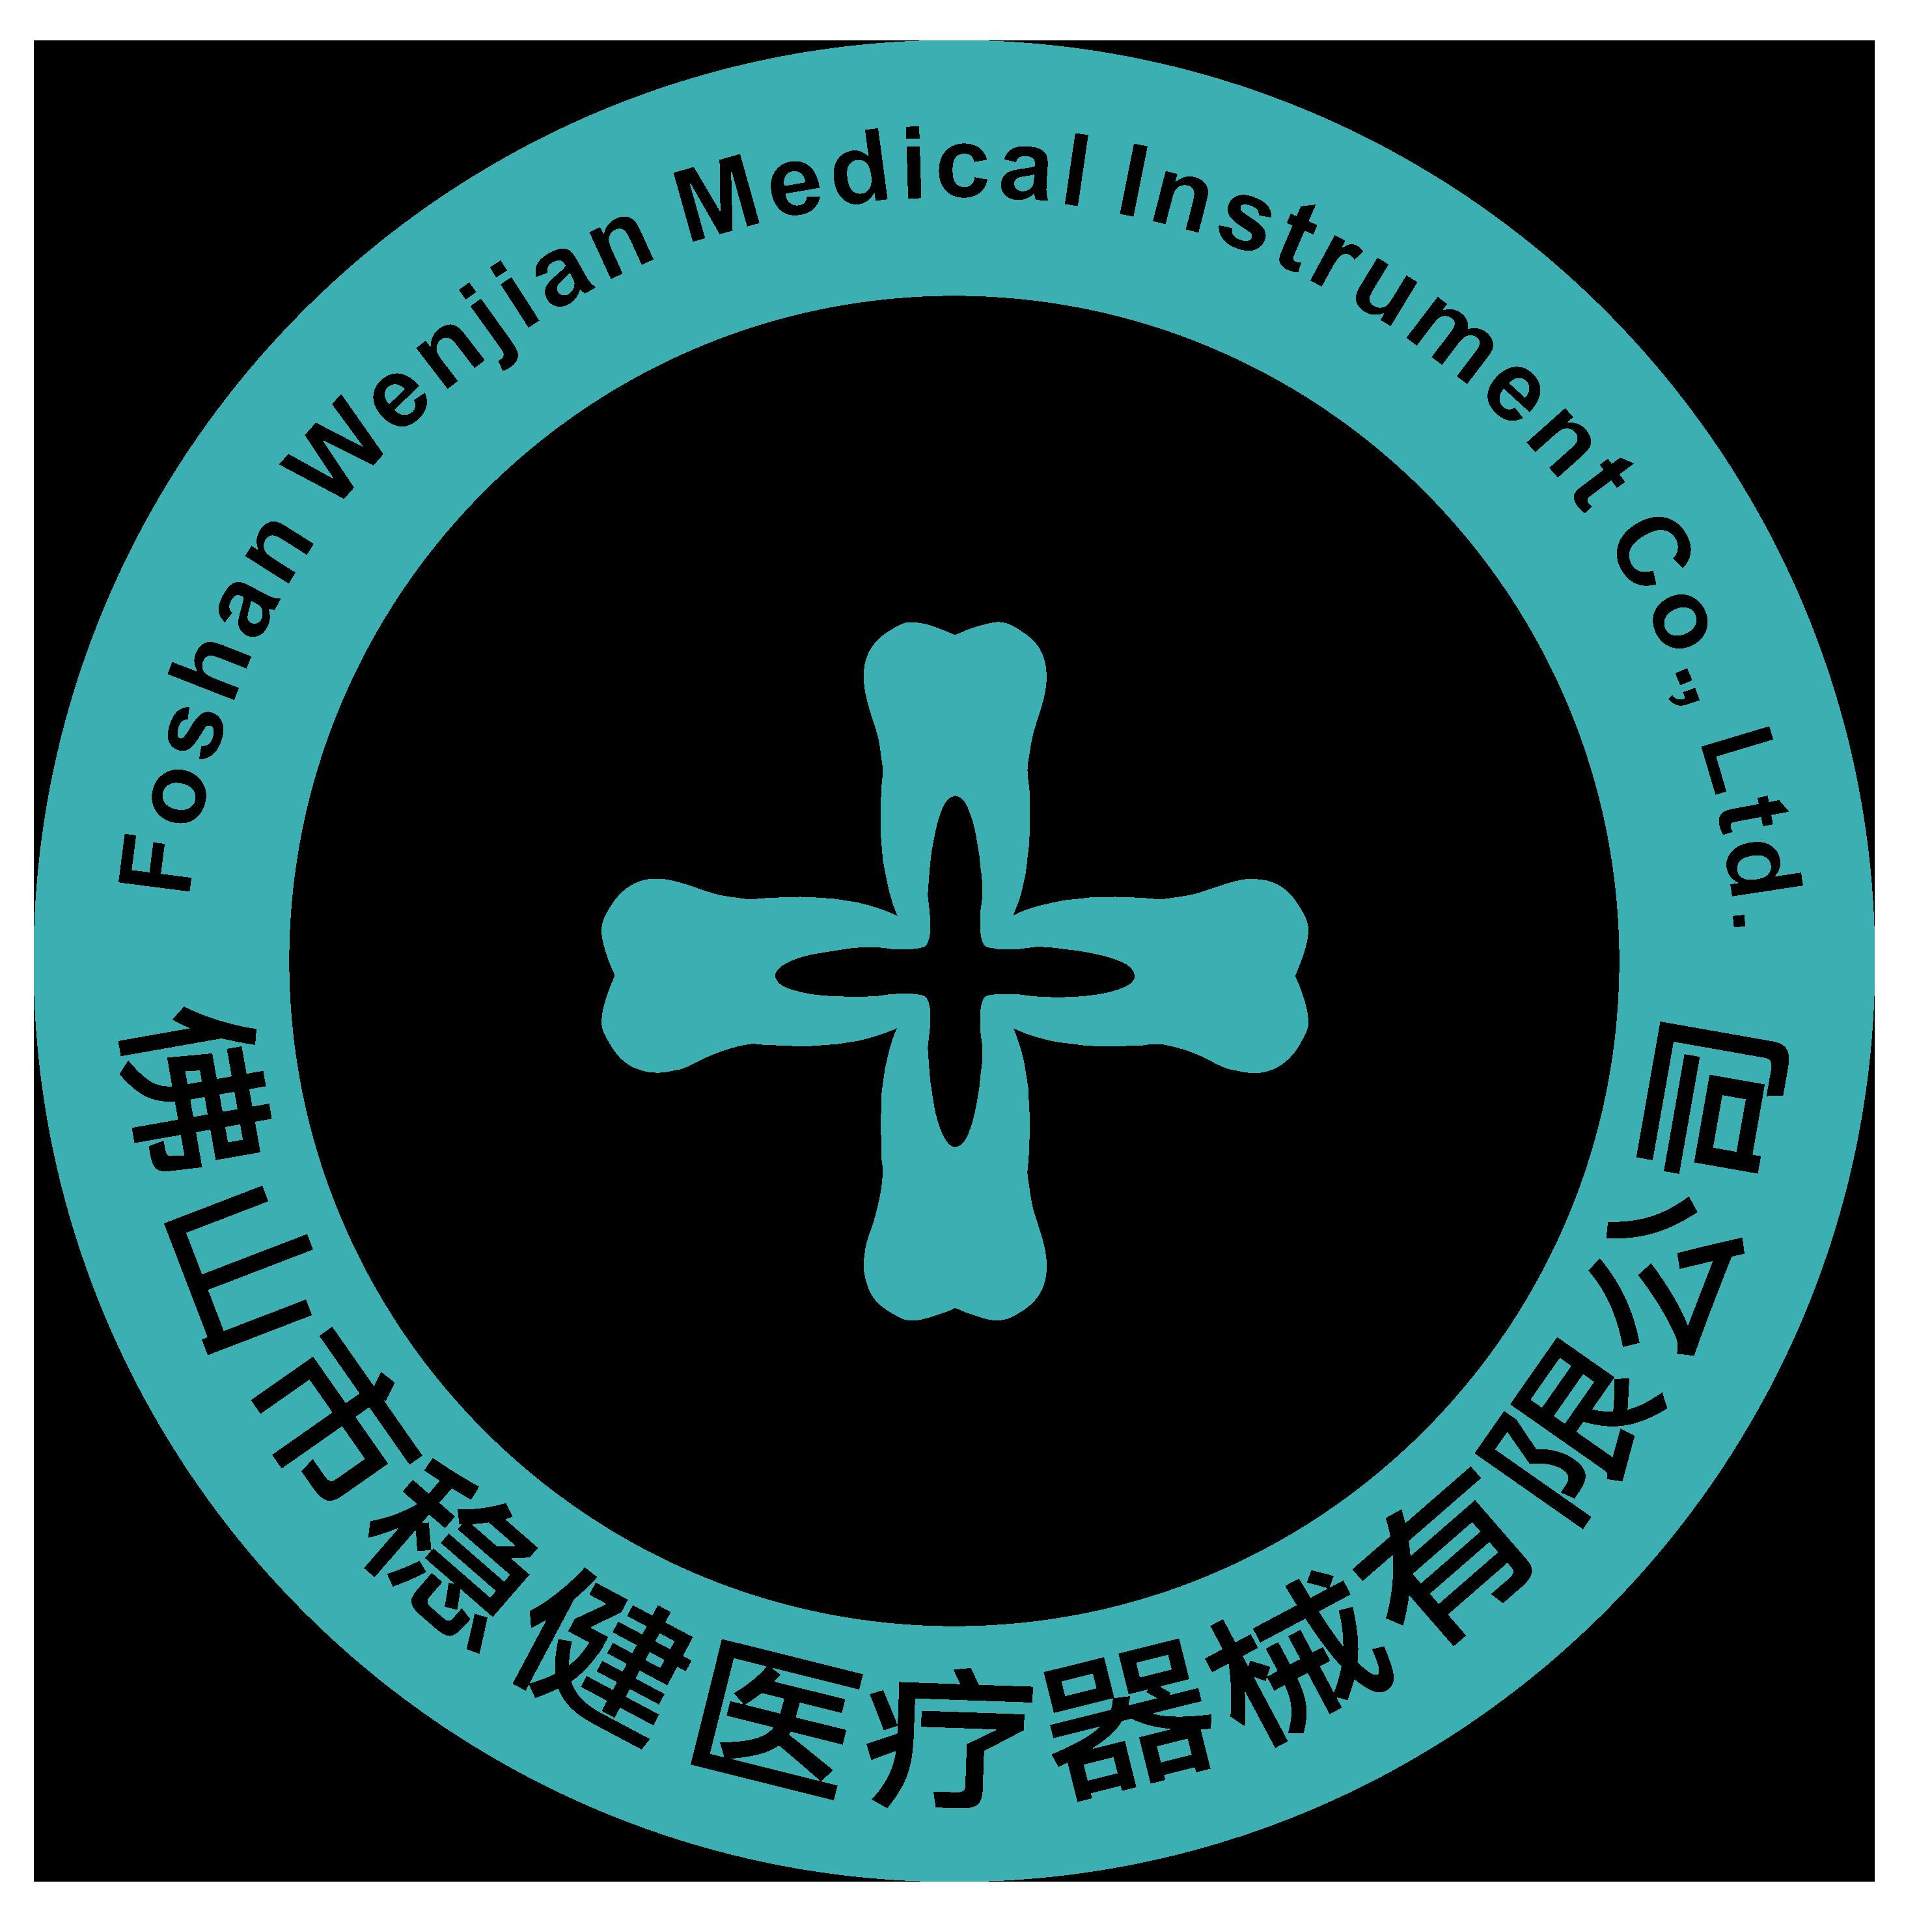 Foshan Wenjian Medical Instrument  Co., Ltd